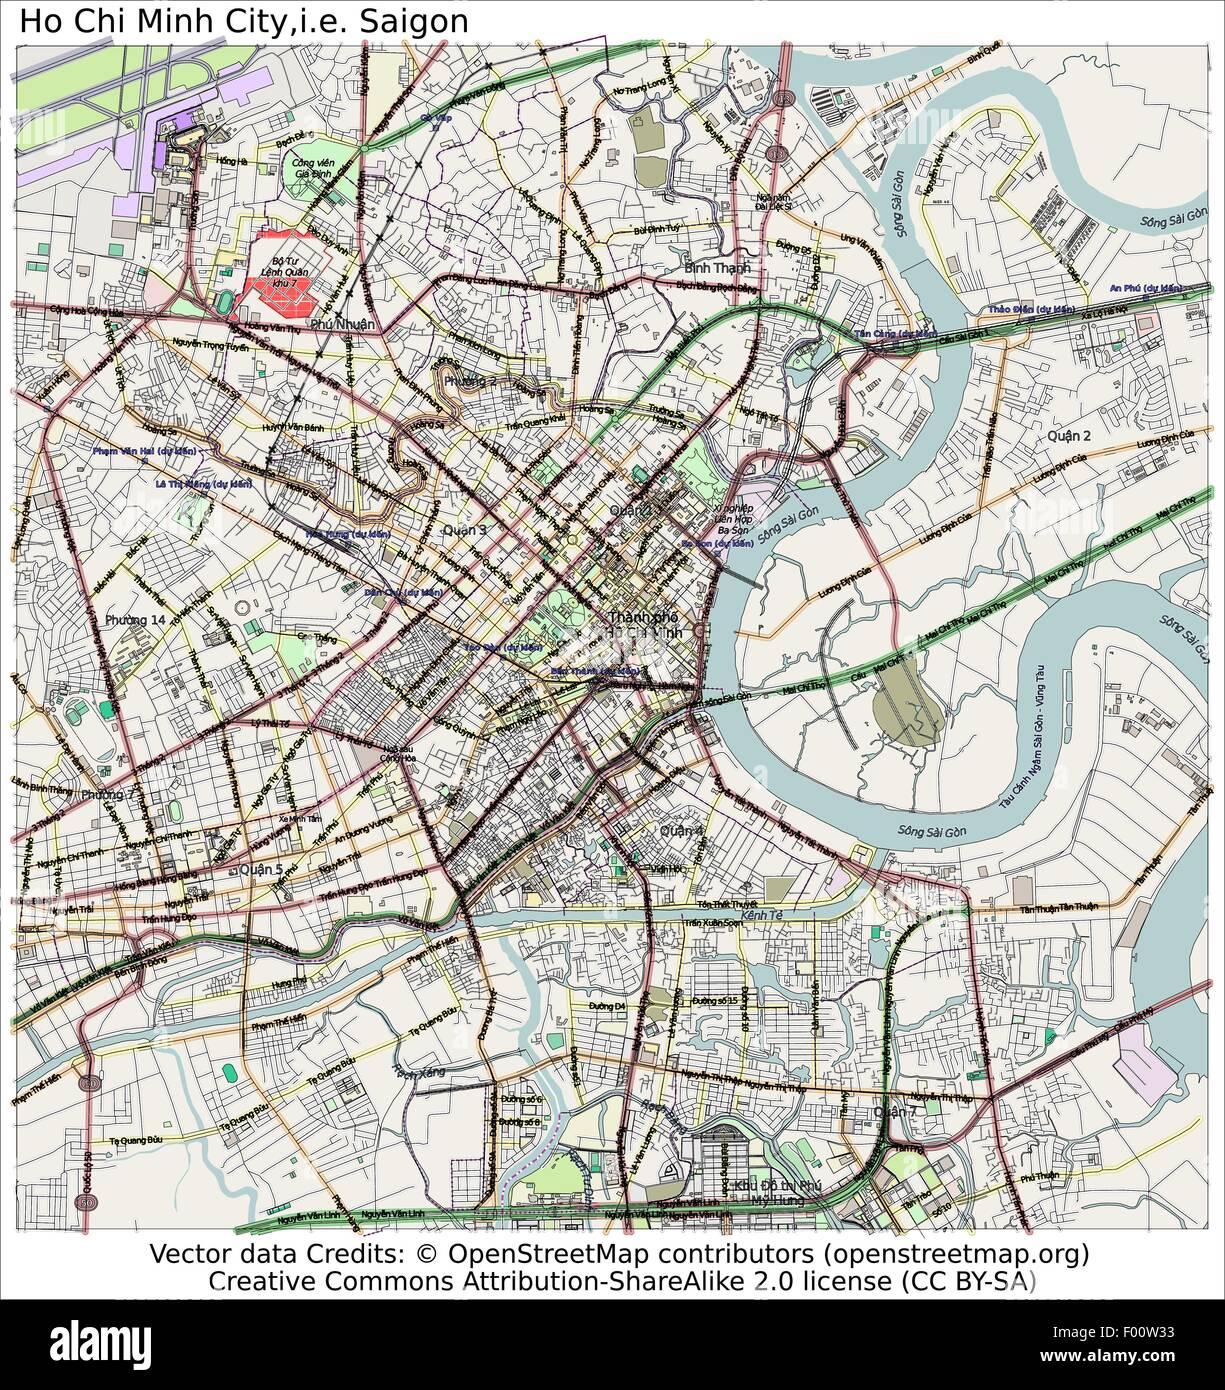 Ho Chi Minh City, Saigon Country city island state location ... Map Bo on